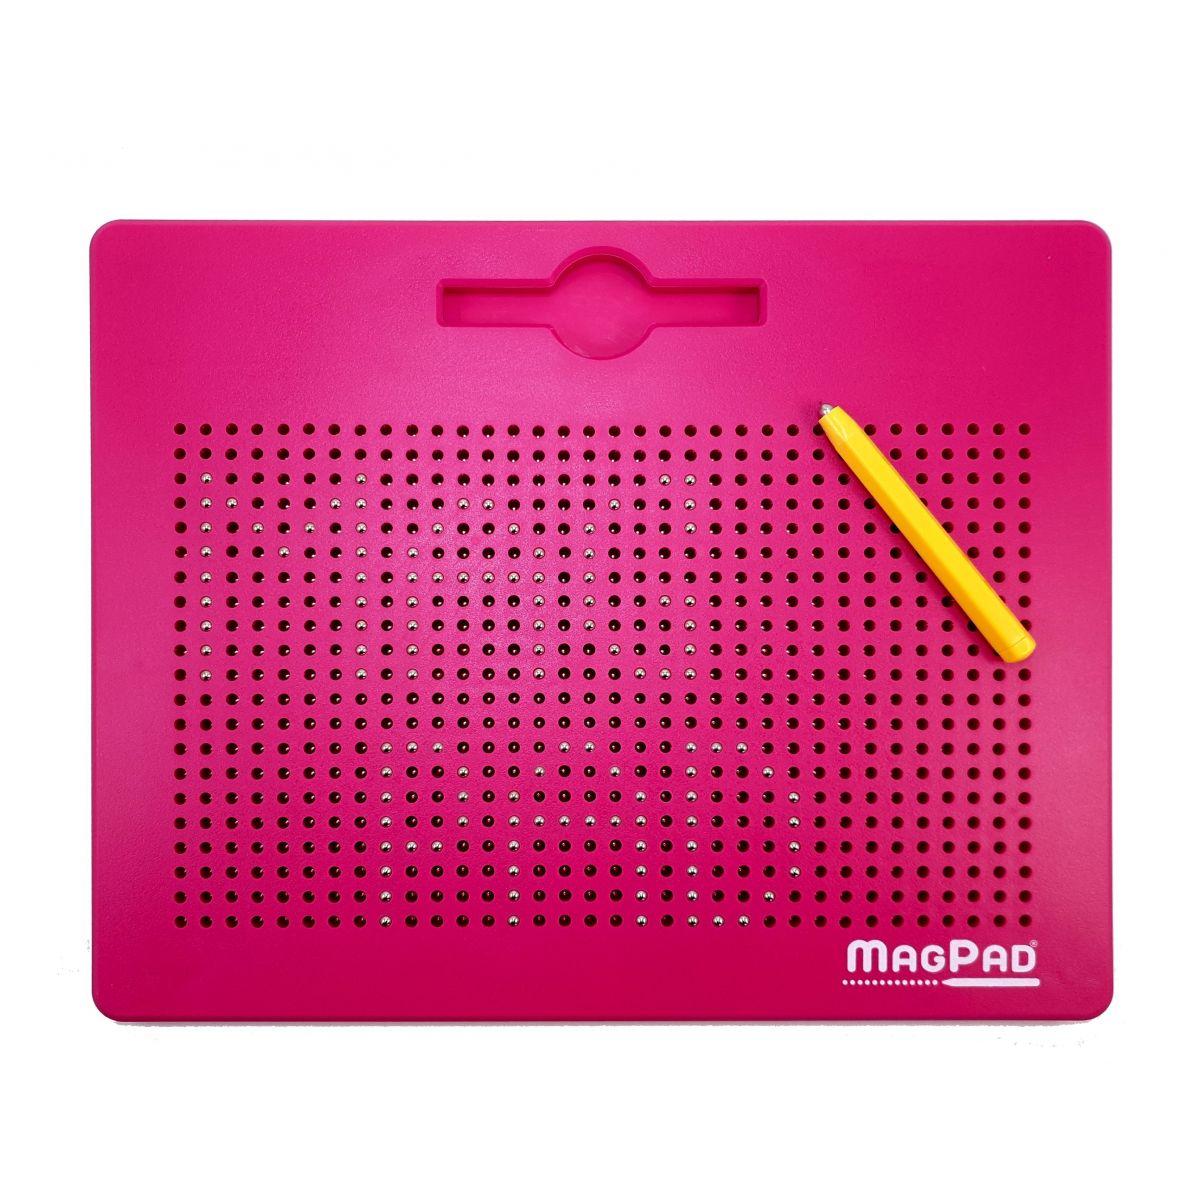 Magpad Magnetická kresliaca tabuľa Big ružová